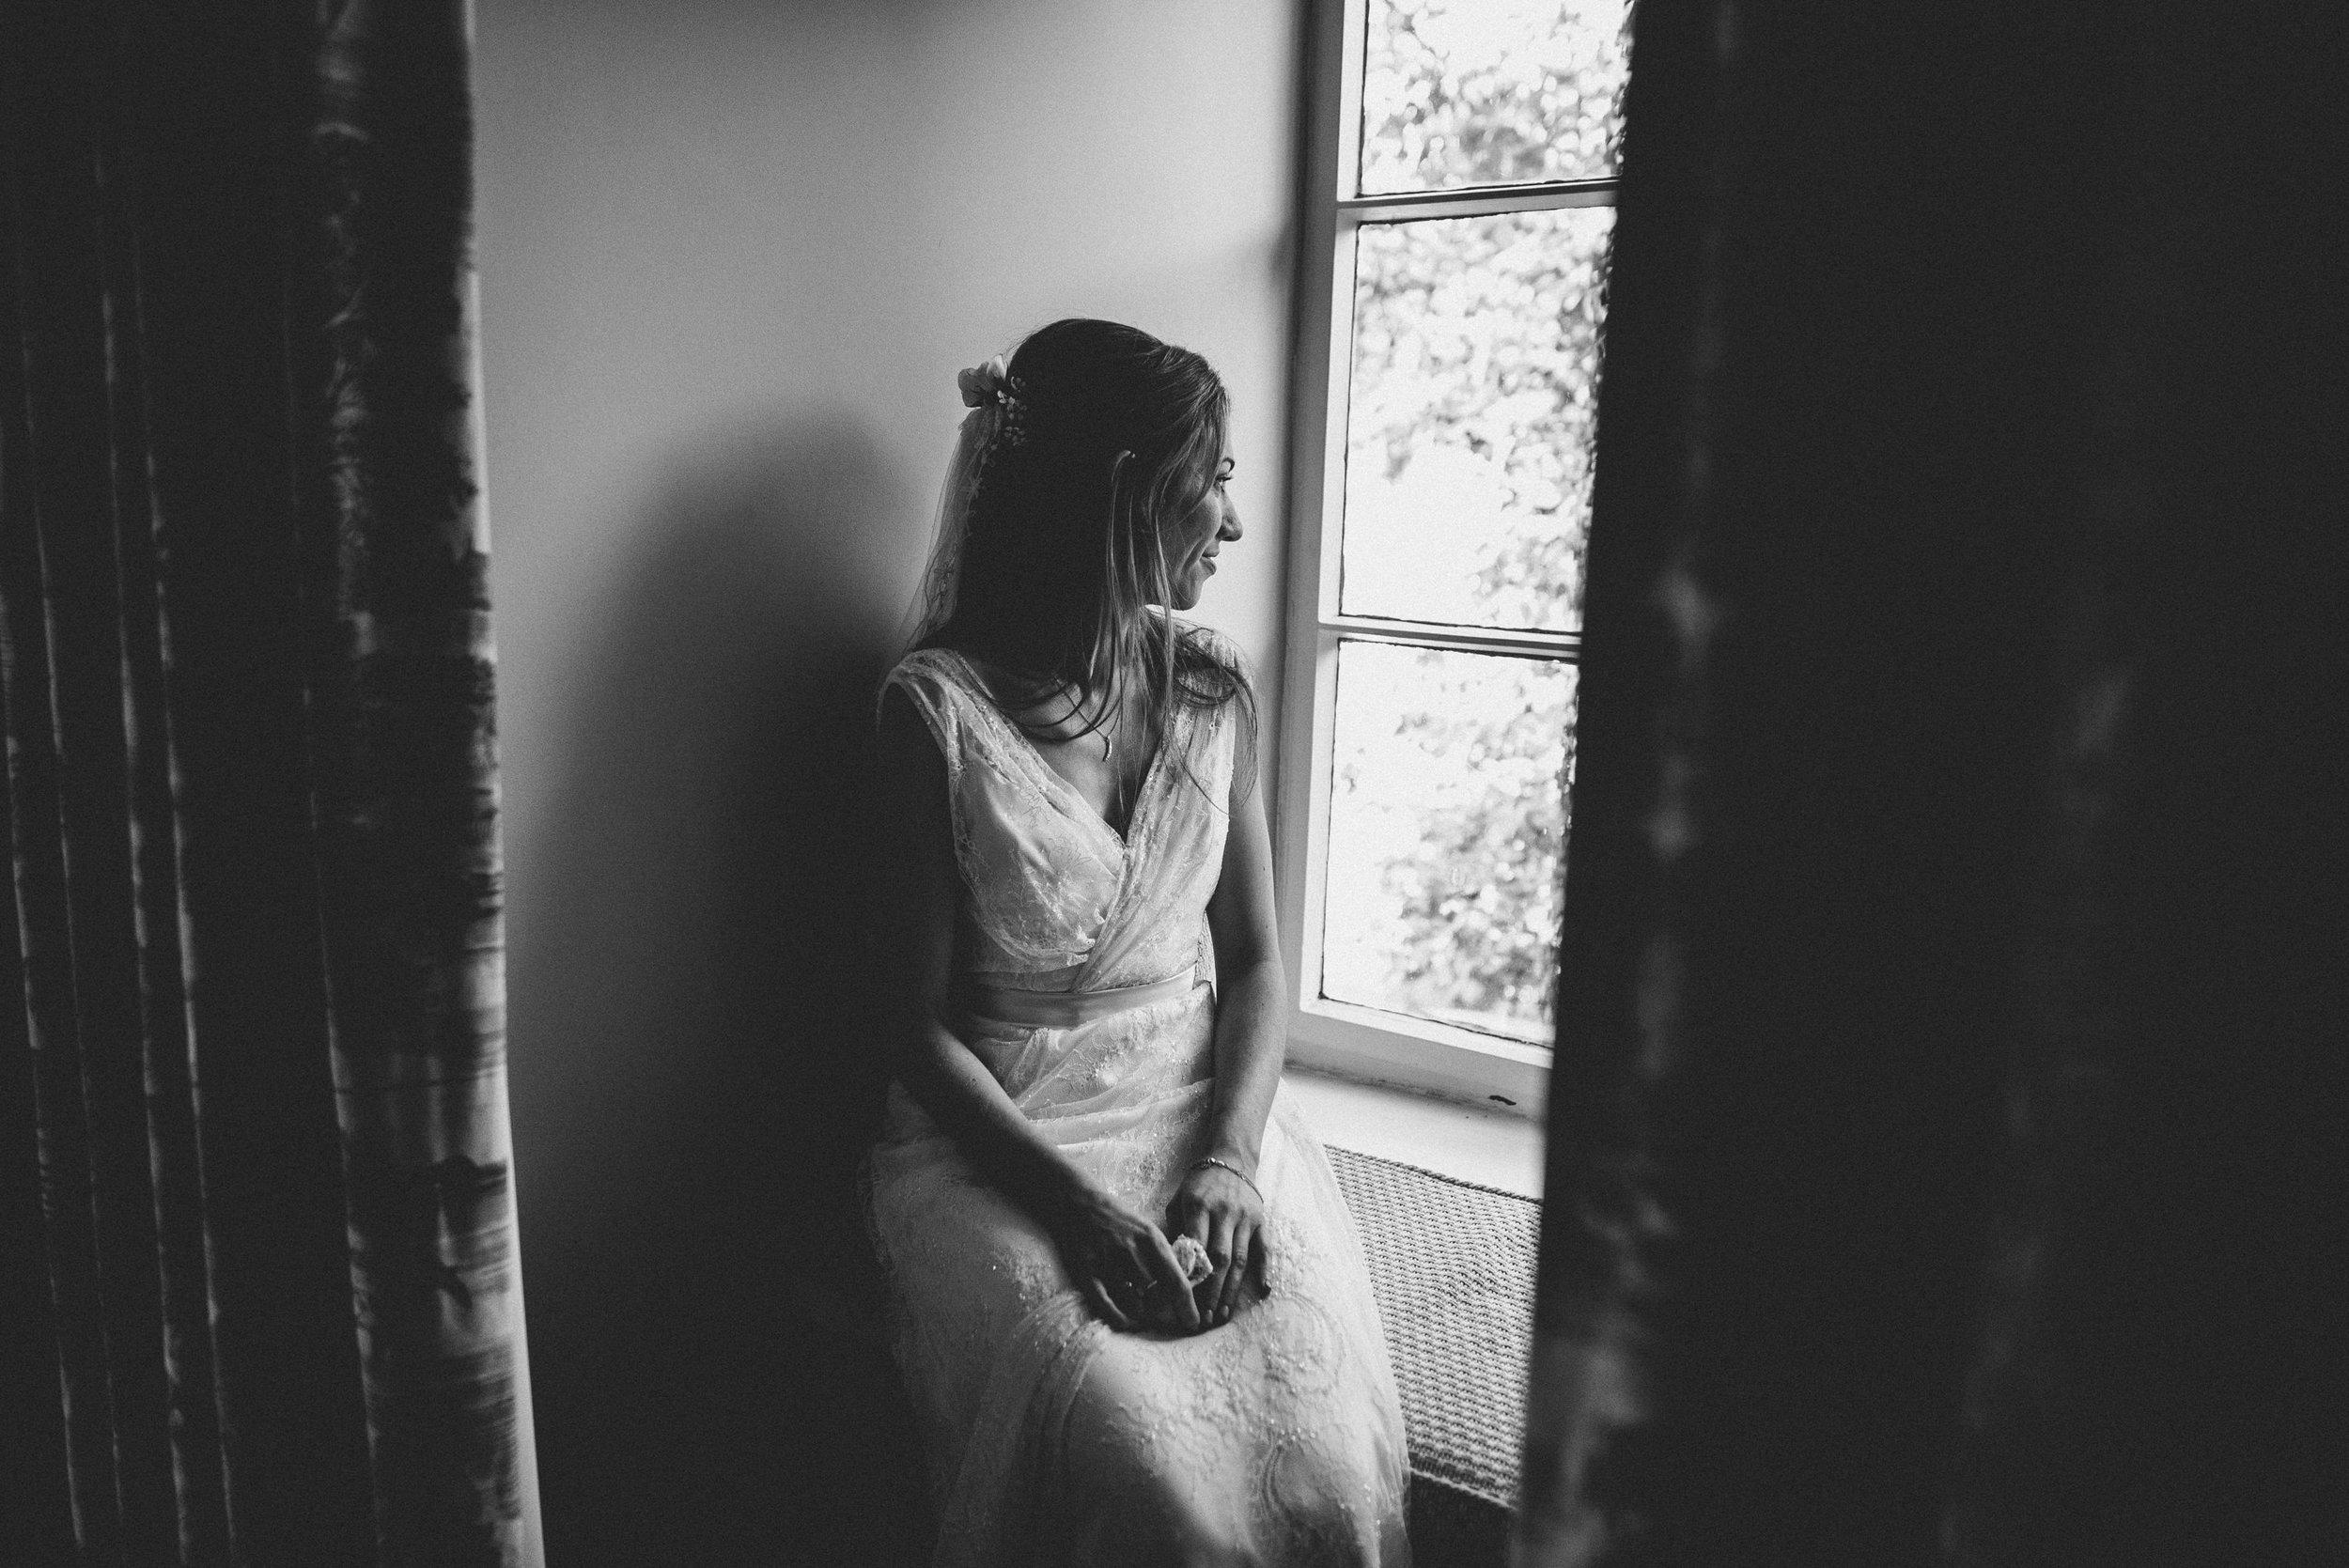 0102-LISA-DEVINE-PHOTOGRAPHY-ALTERNATIVE-WEDDING-PHOTOGRAPHY-SCOTLAND-DESTINATION-WEDDINGS-GLASGOW-WEDDINGS-COOL-WEDDINGS-STYLISH-WEDDINGS.JPG